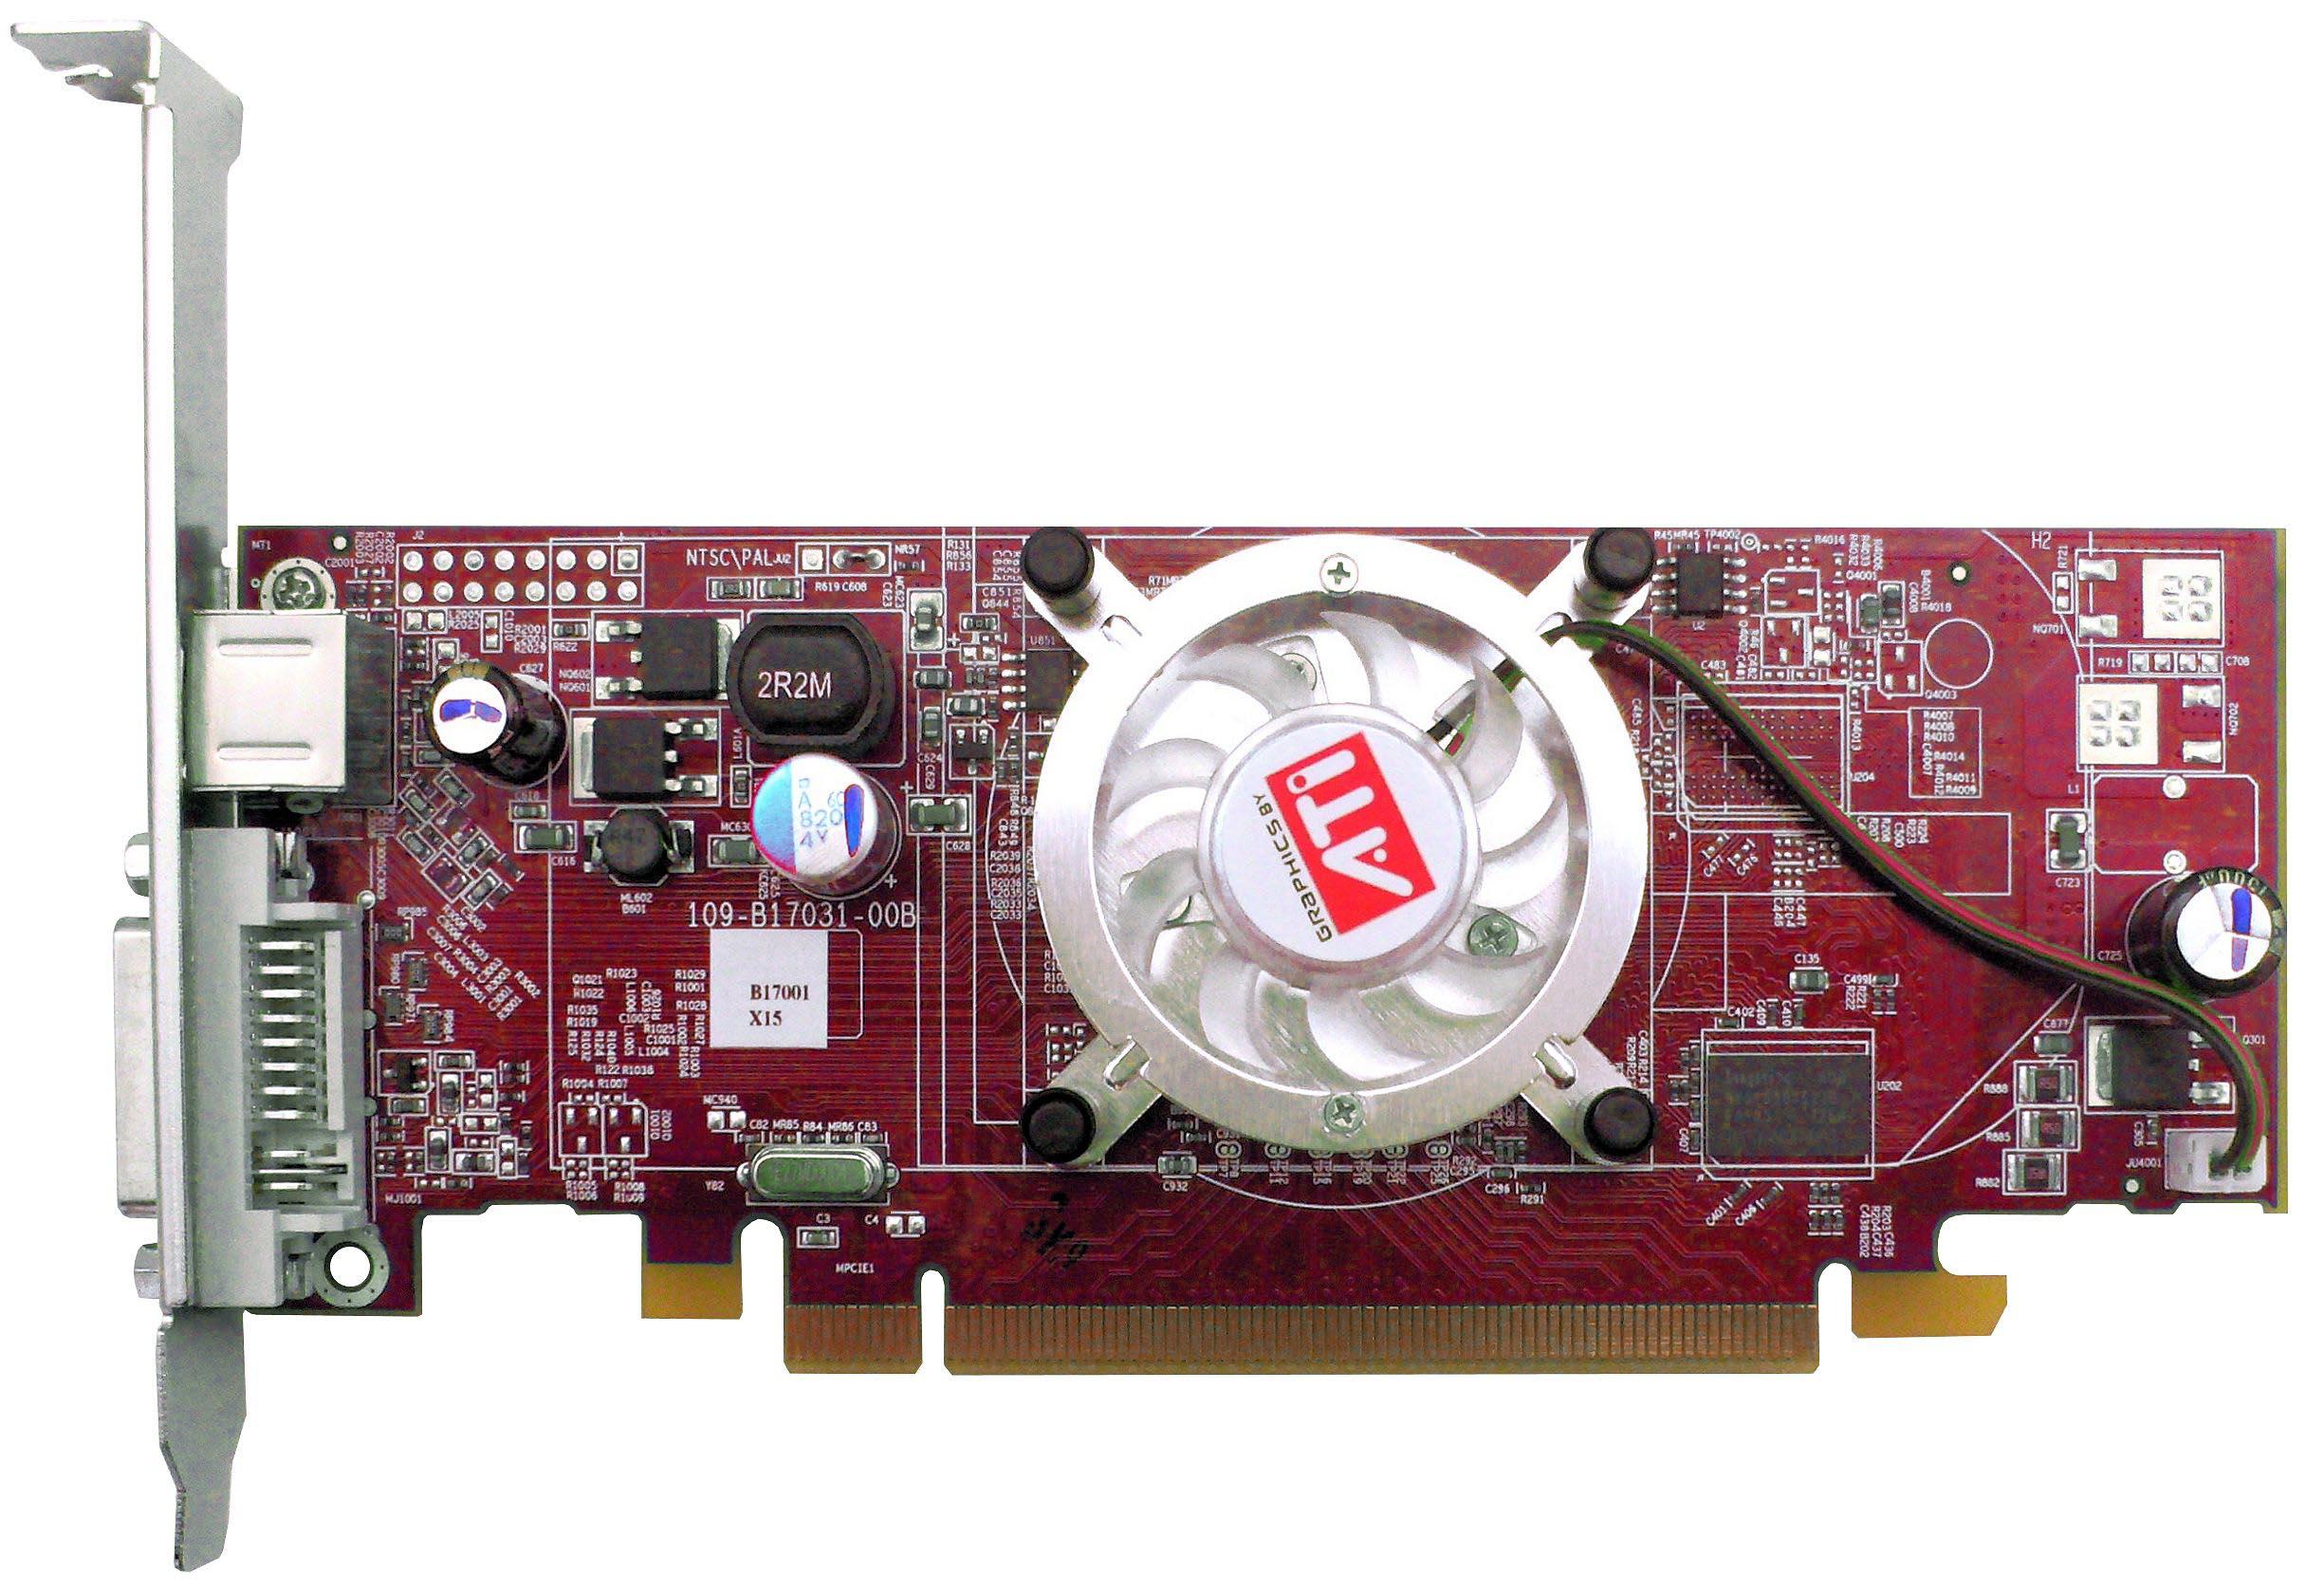 ATI MOBILITY RADEON HD 2300 OPENGL DRIVERS FOR PC